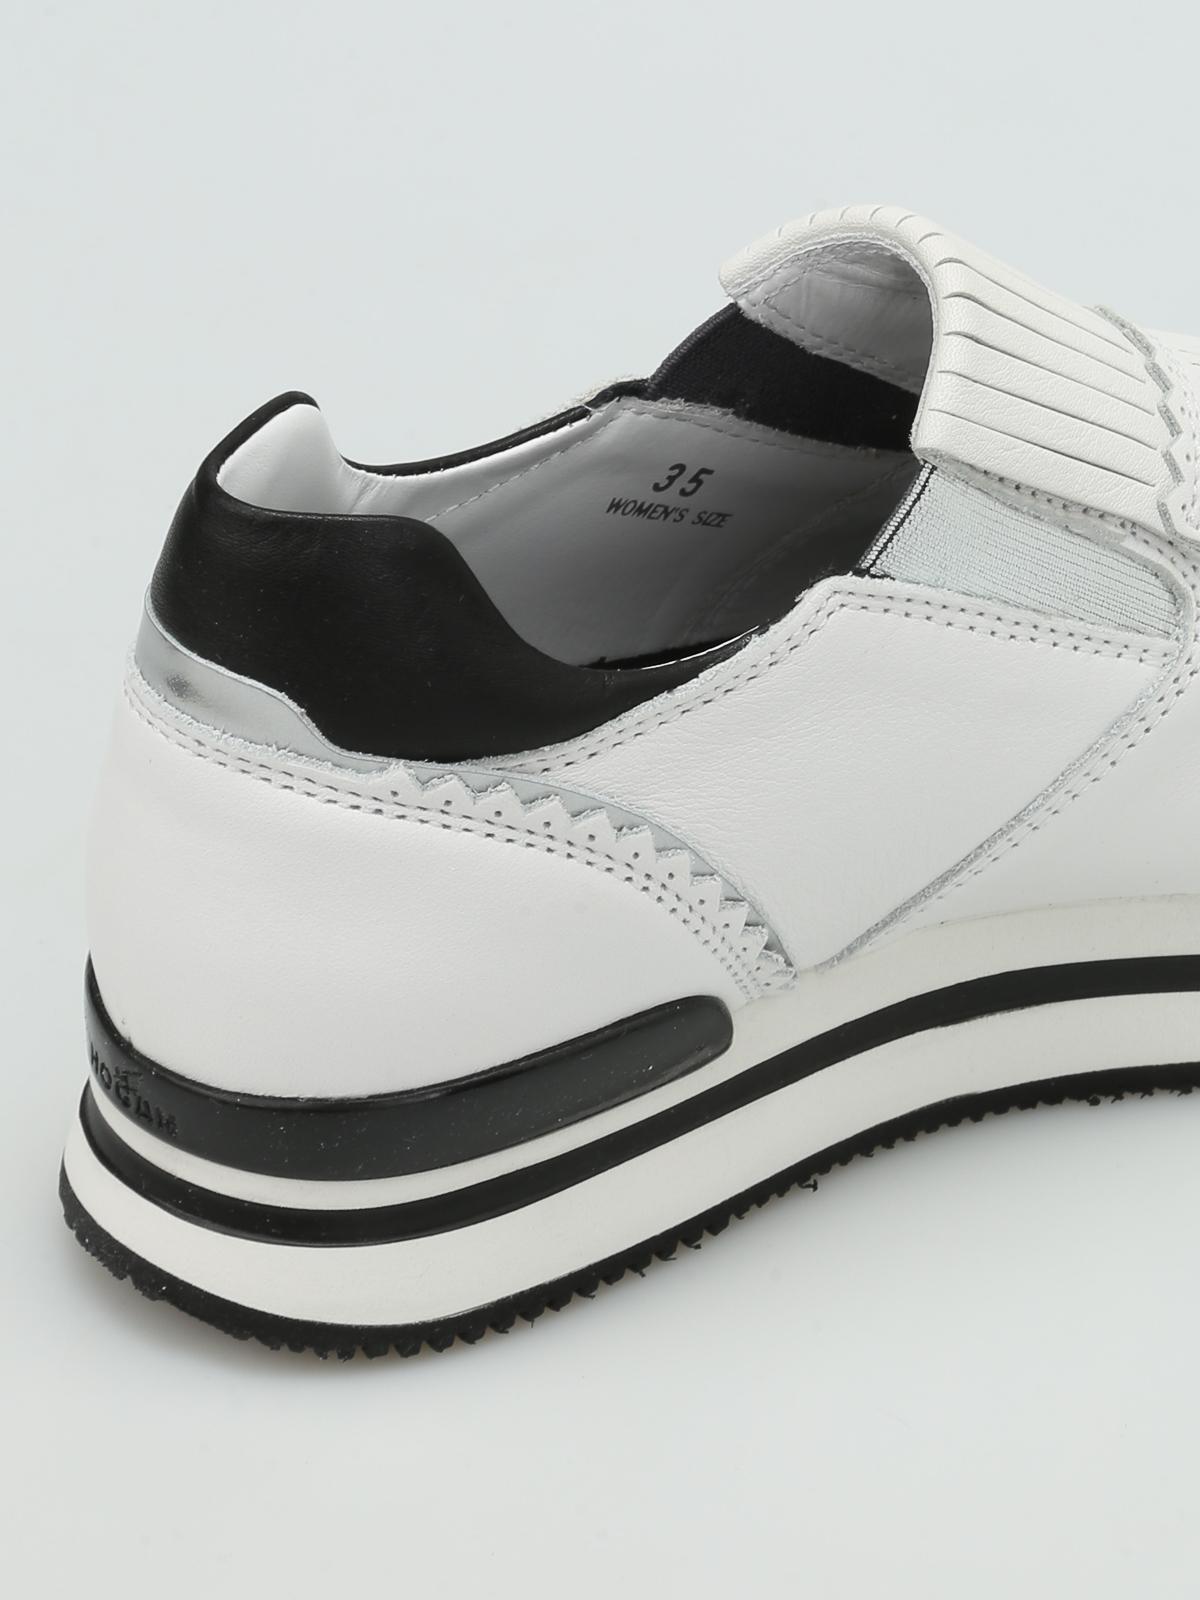 Hogan - H222 fringed leather slip-ons - trainers - HXW2220X170DZF016U